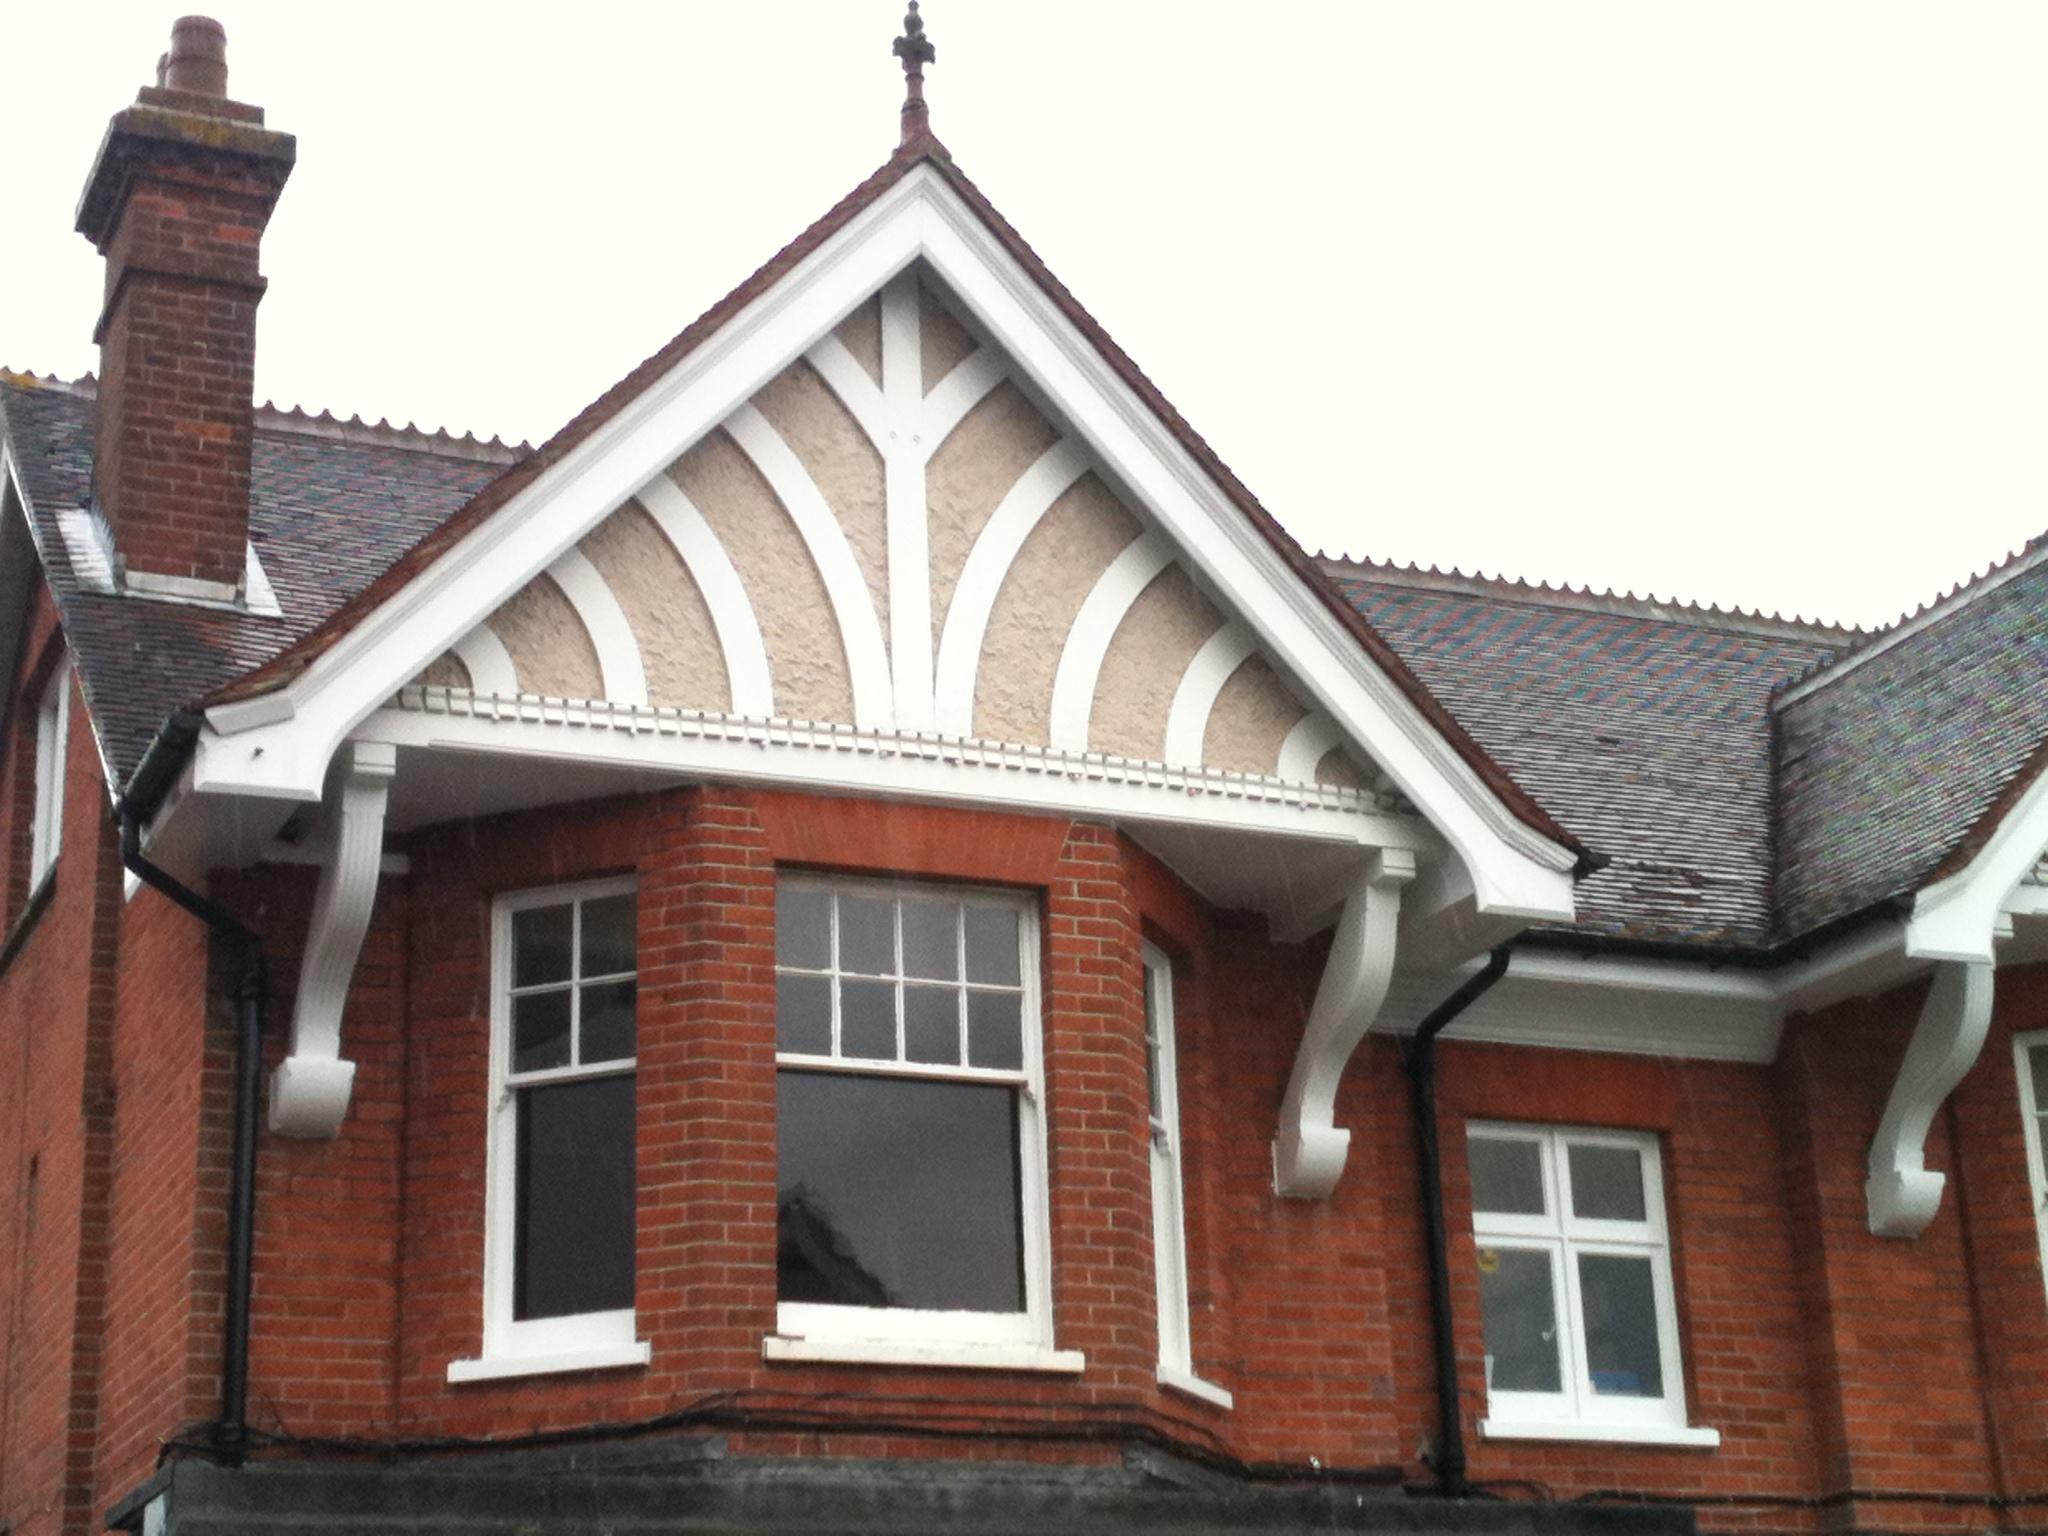 Aberdeen House Dental Practice - Hindhead, Hampshire GU26 6LD - 01428 605405 | ShowMeLocal.com